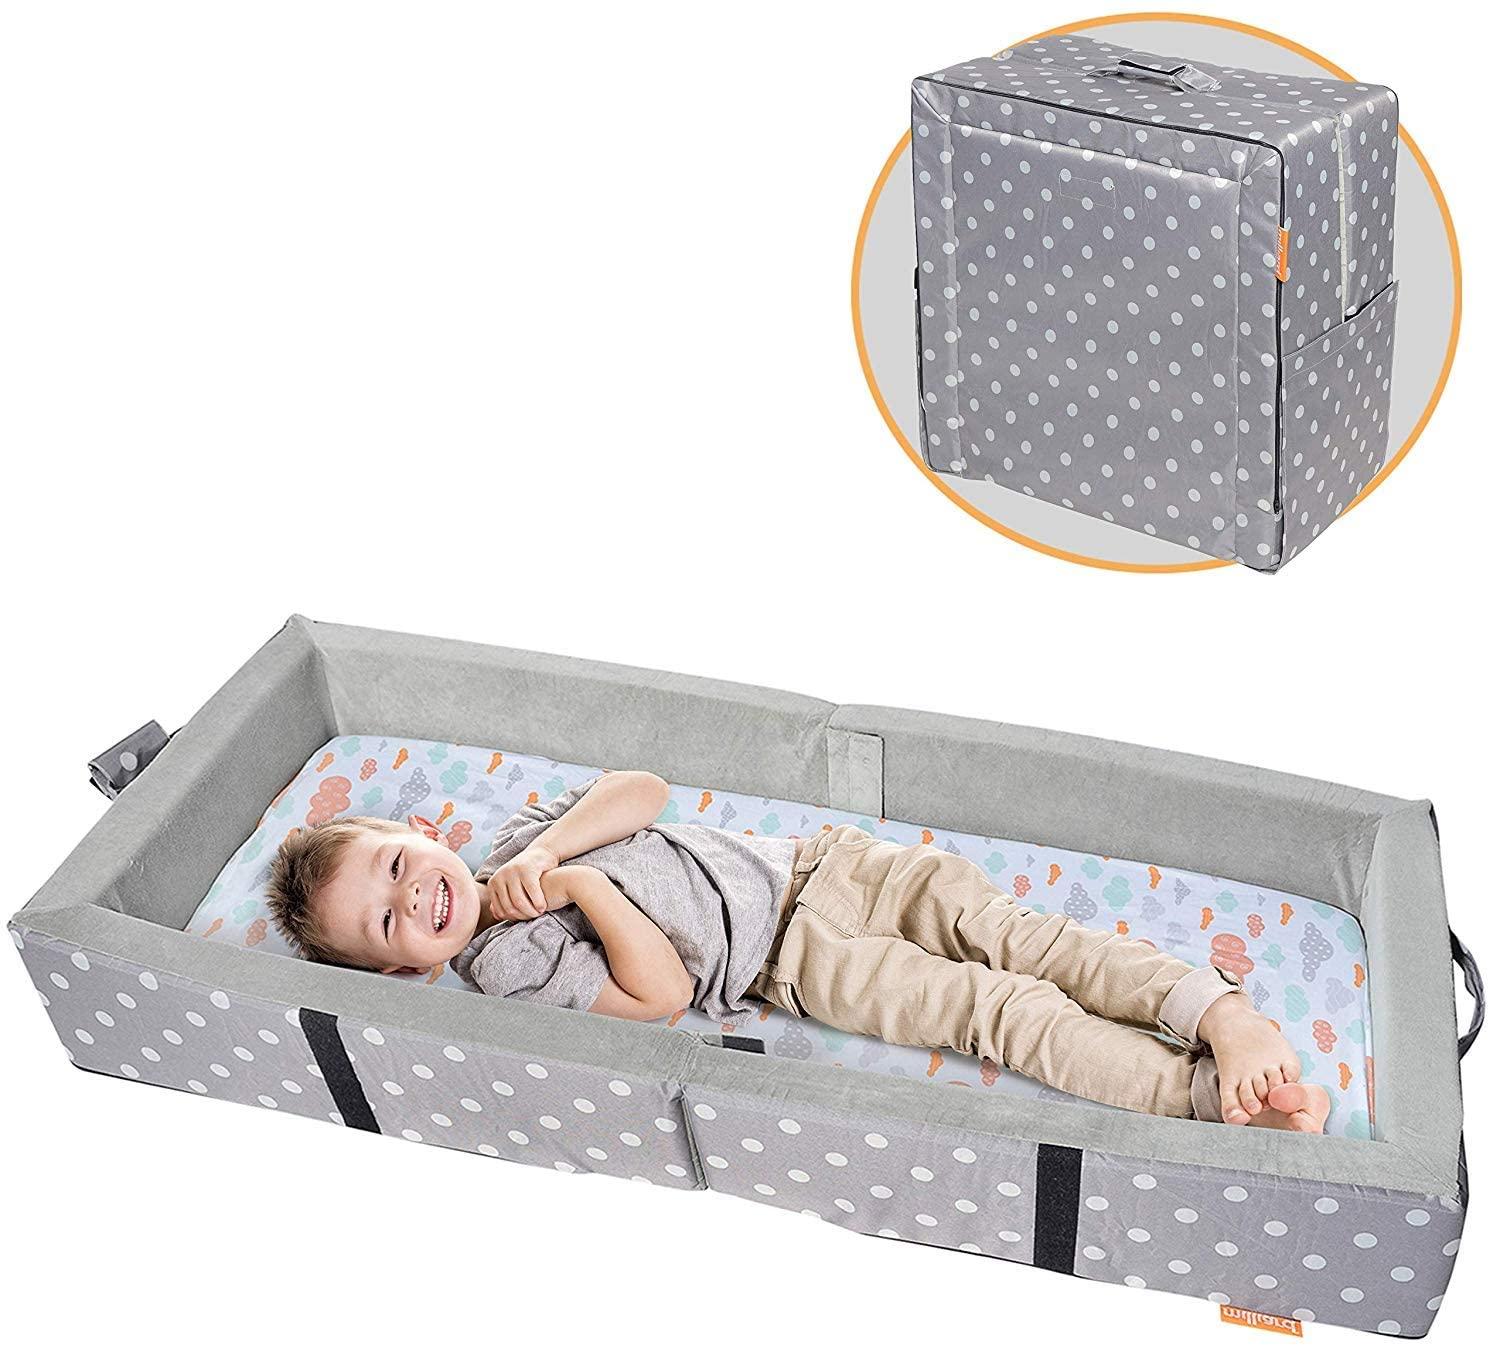 Milliard Portable Toddler Travel Nap Mat